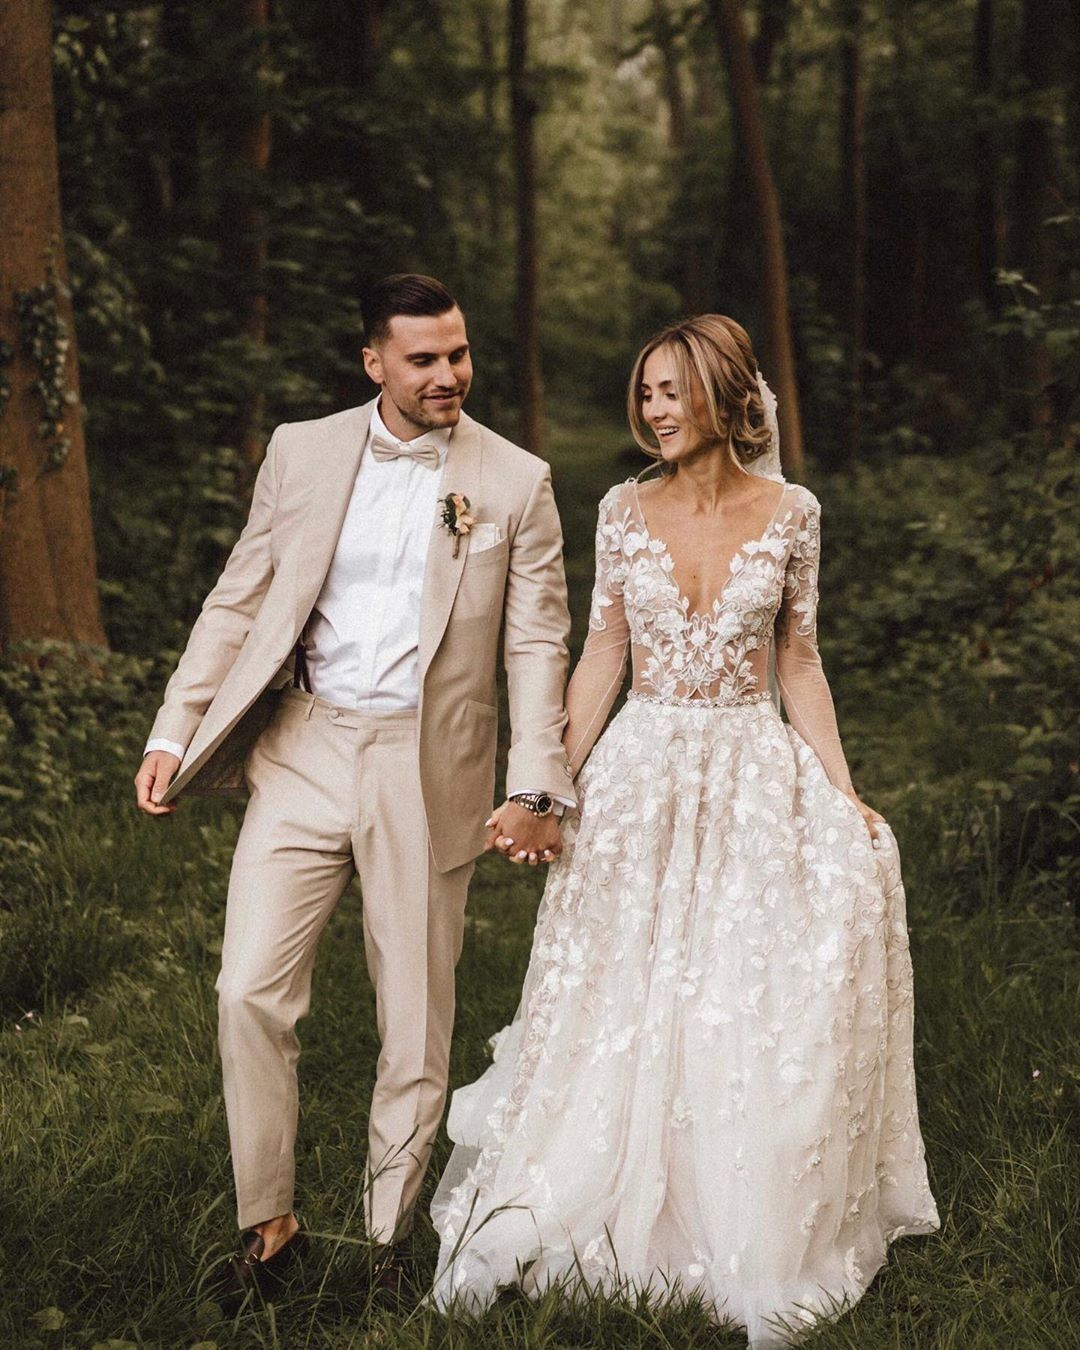 30 Floral Applique Wedding Dresses You Might Find In Blair Waldorf S Closet Applique Wedding Dress Wedding Dresses Embellished Wedding Dress [ 1350 x 1080 Pixel ]